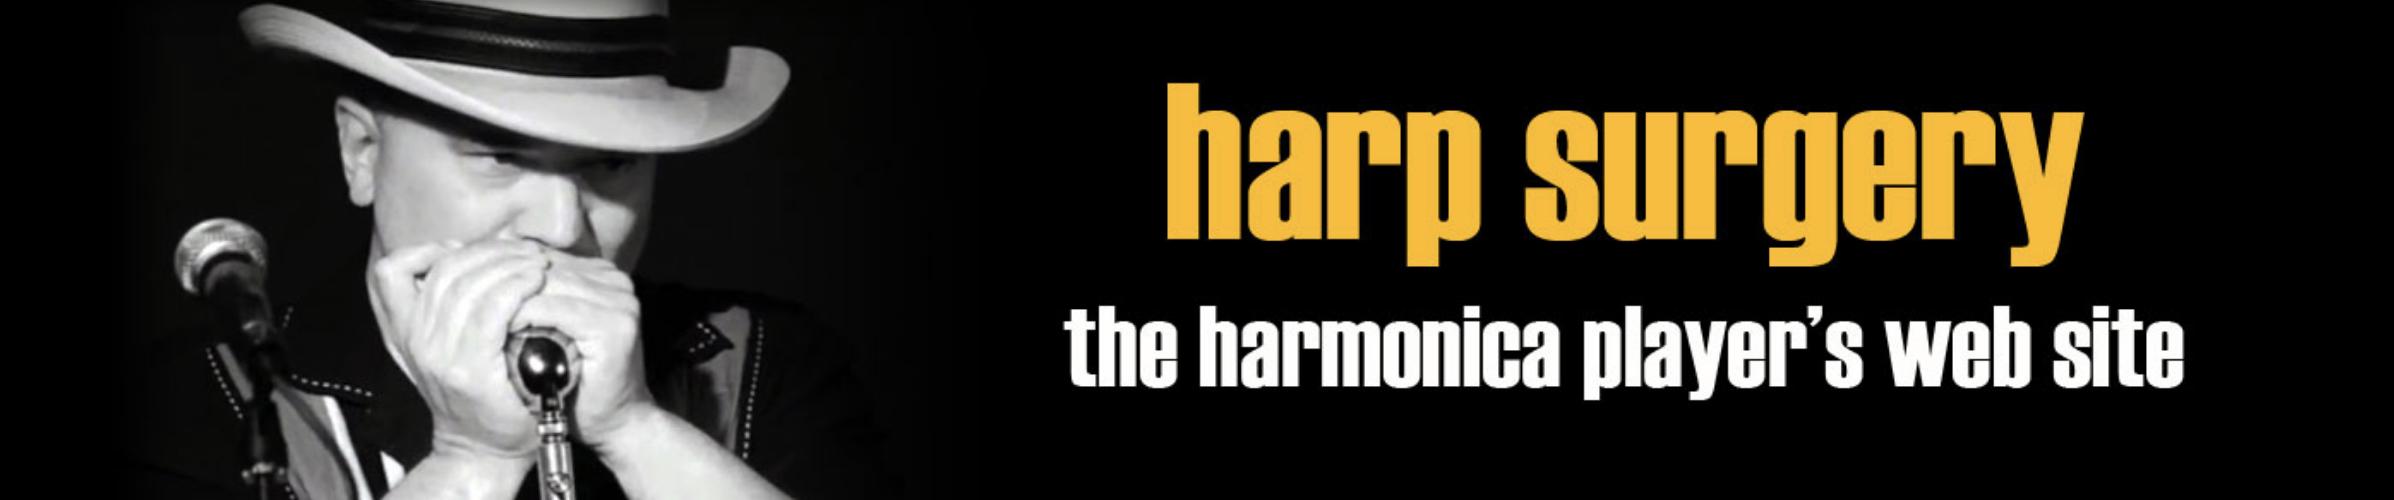 http://www.harpsurgery.com/